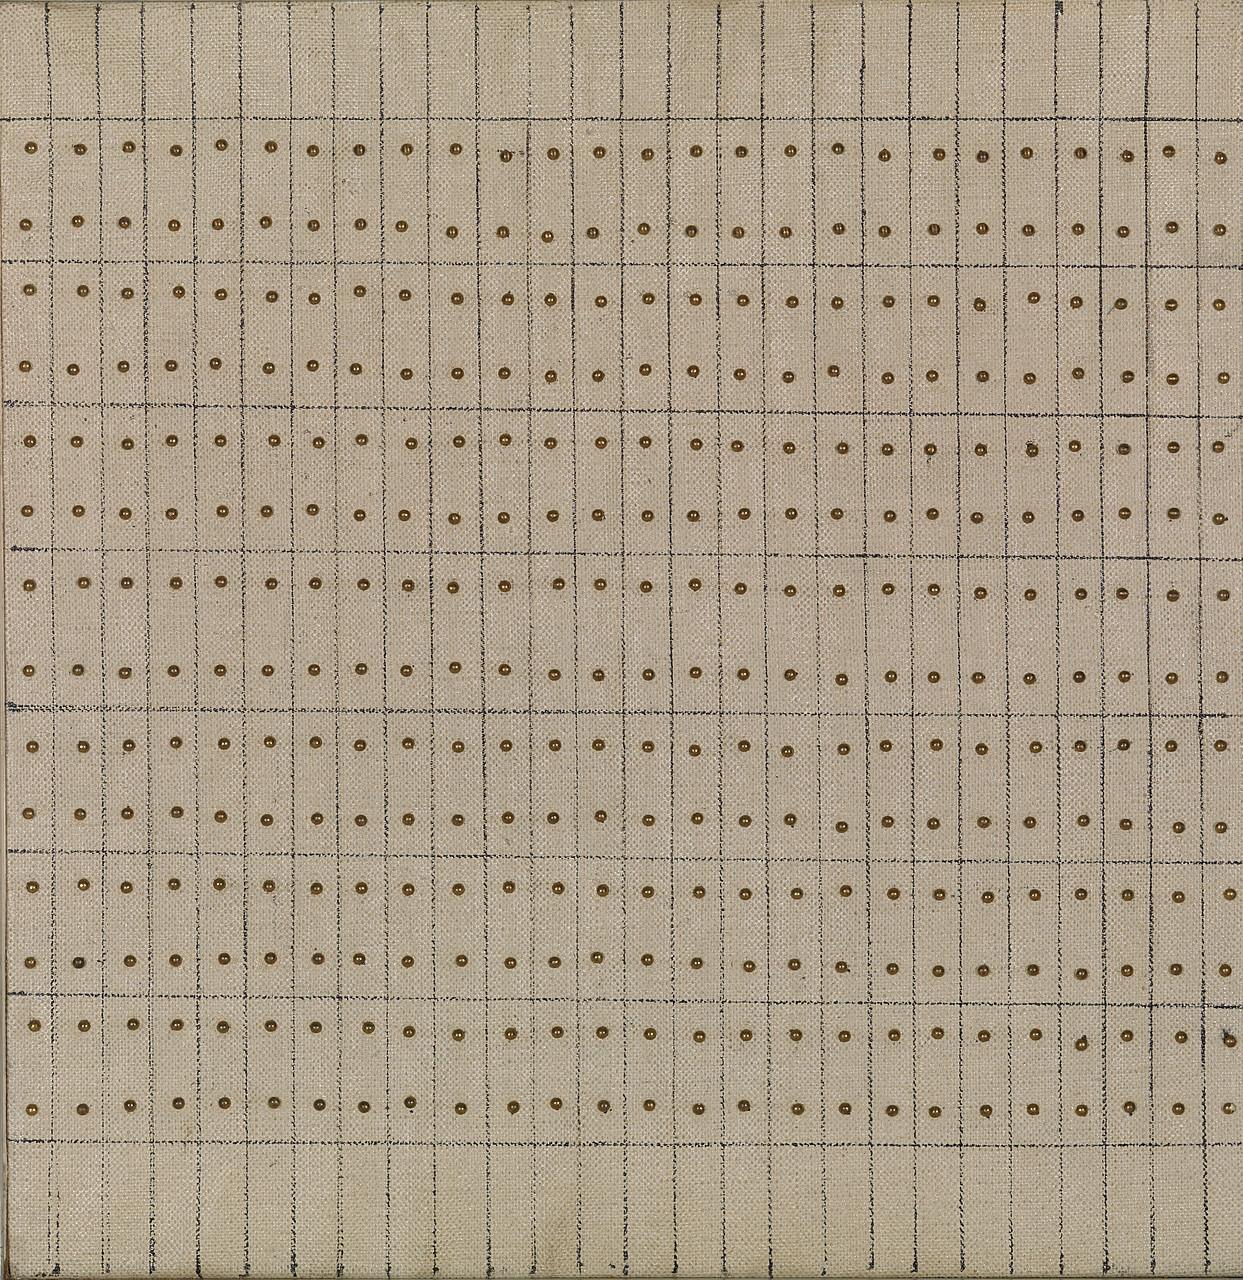 Agnes Martin, Little Sister, 1962. Clavos al óleo, tinta y latón sobre lienzo sobre madera, 9 7/8 x 9 11/16 pulgadas (25,1 x 24,6 cm)